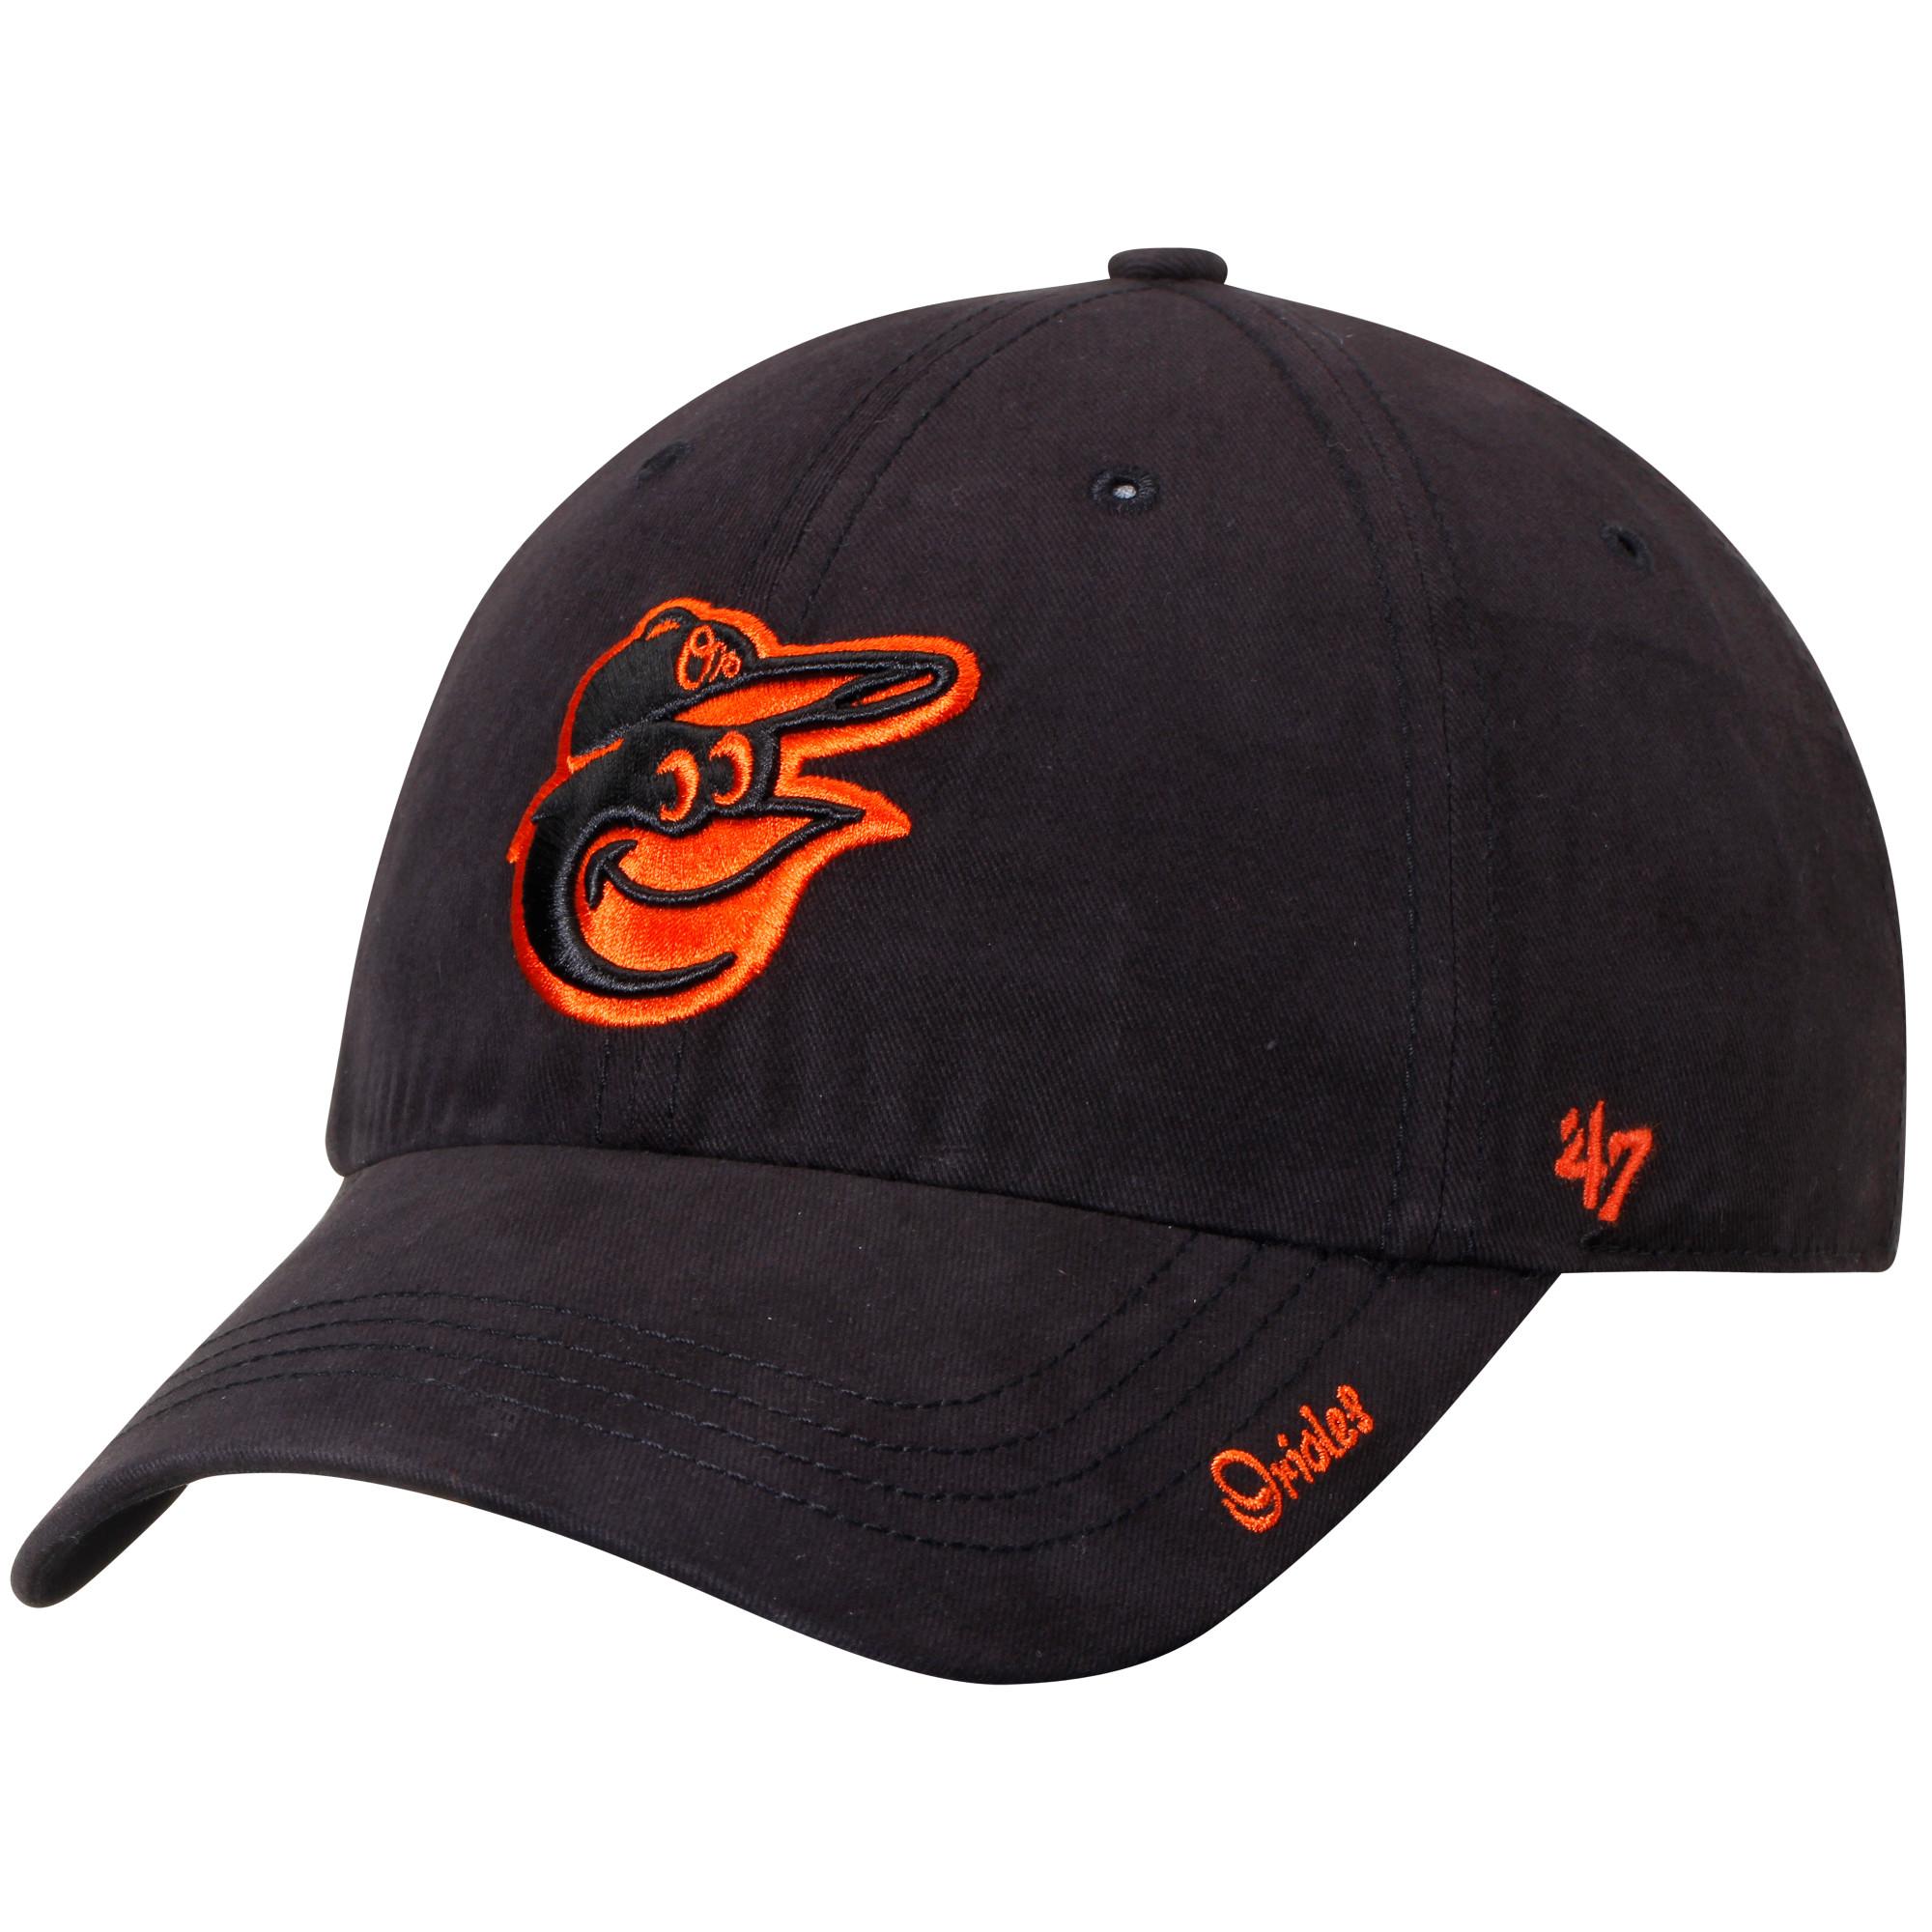 Baltimore Orioles '47 Women's Miata Clean Up Adjustable Hat - Black - OSFA